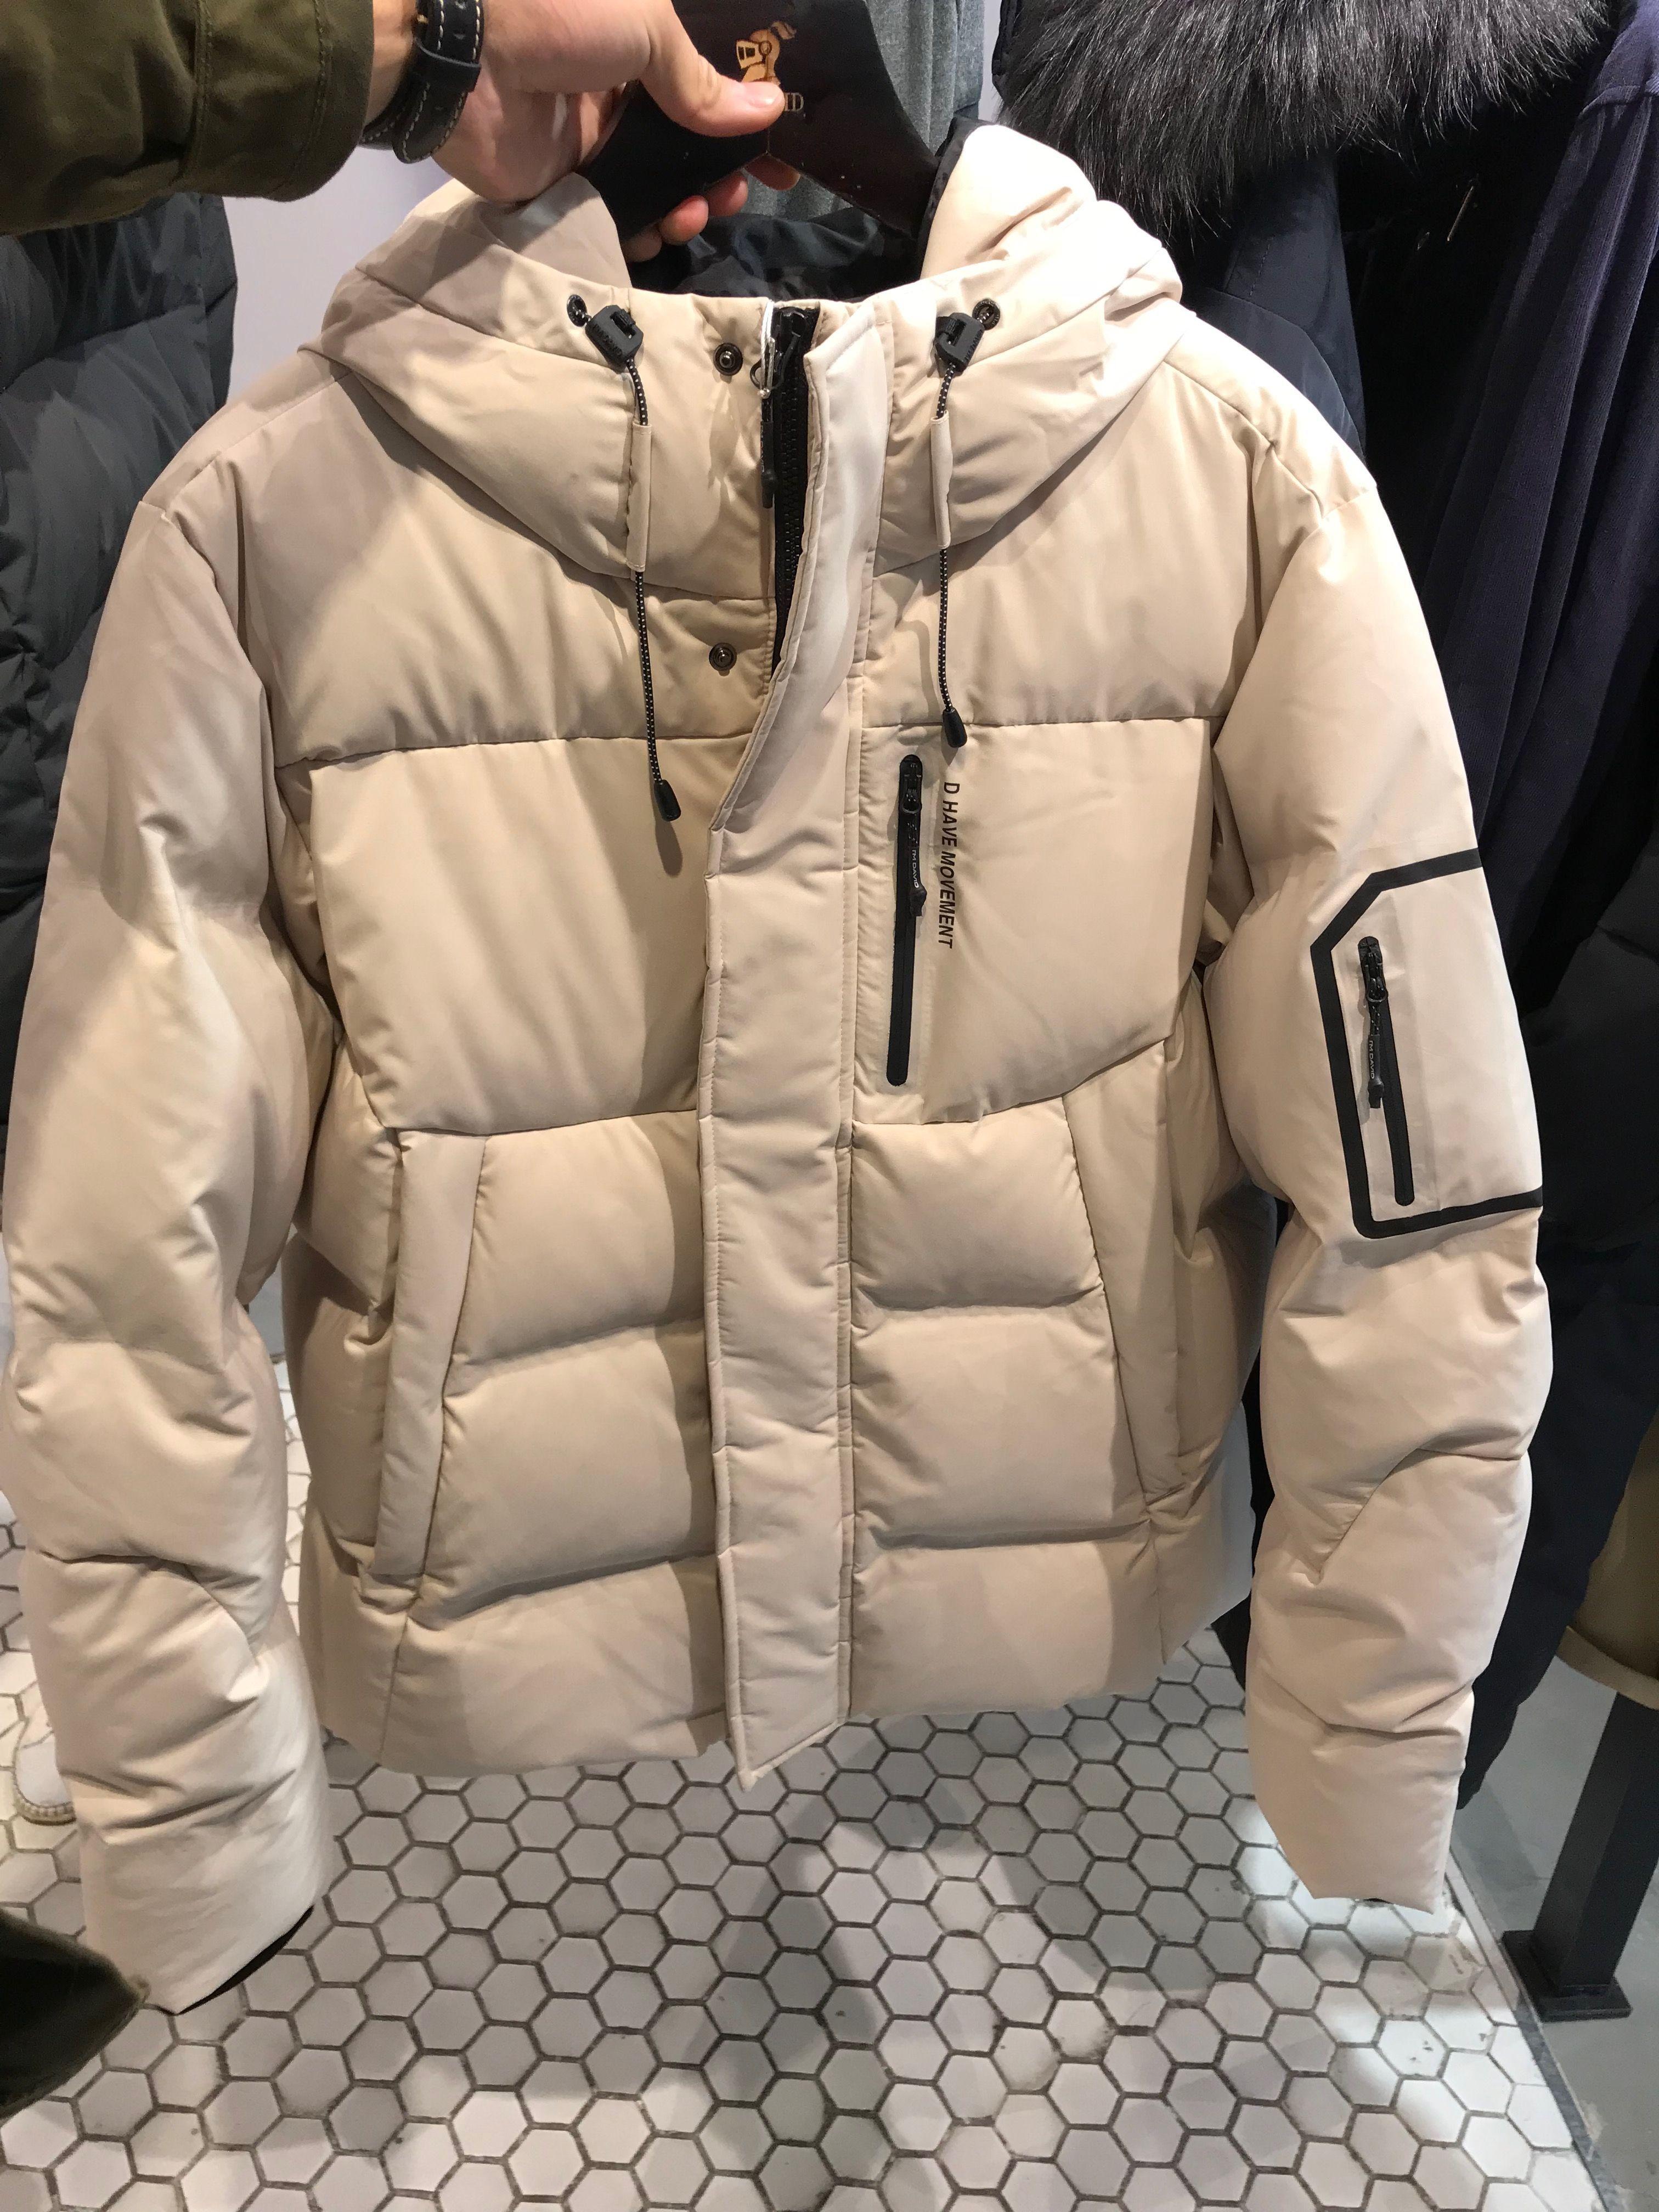 Imdavid Brand White Popular Down Jacket A Little Design That Hides The Zipper Mens Outerwear Jacket Mens Outerwear Fashion Men Outerwear Casual [ 4032 x 3024 Pixel ]